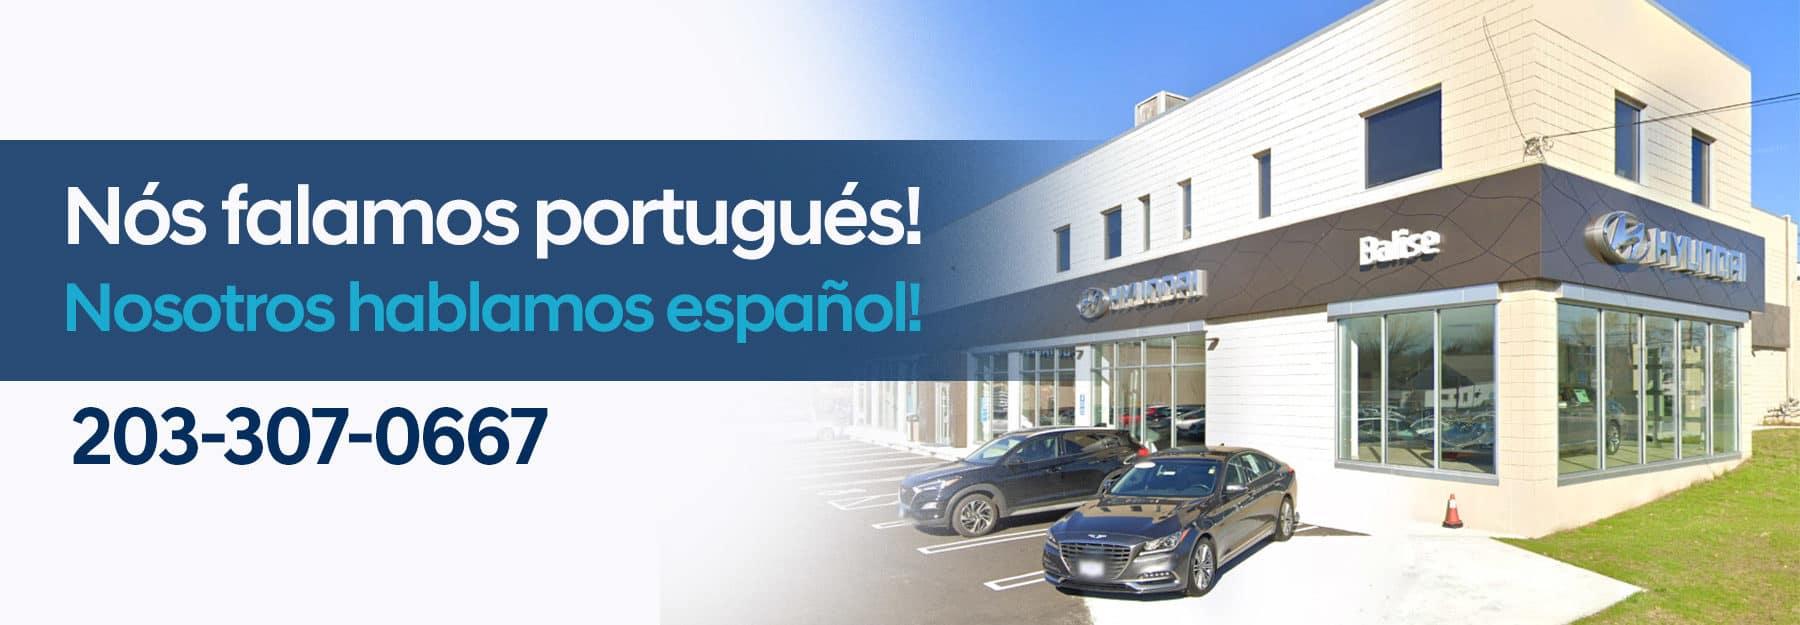 Nós falamos portugués! Nosotros hablamos español!